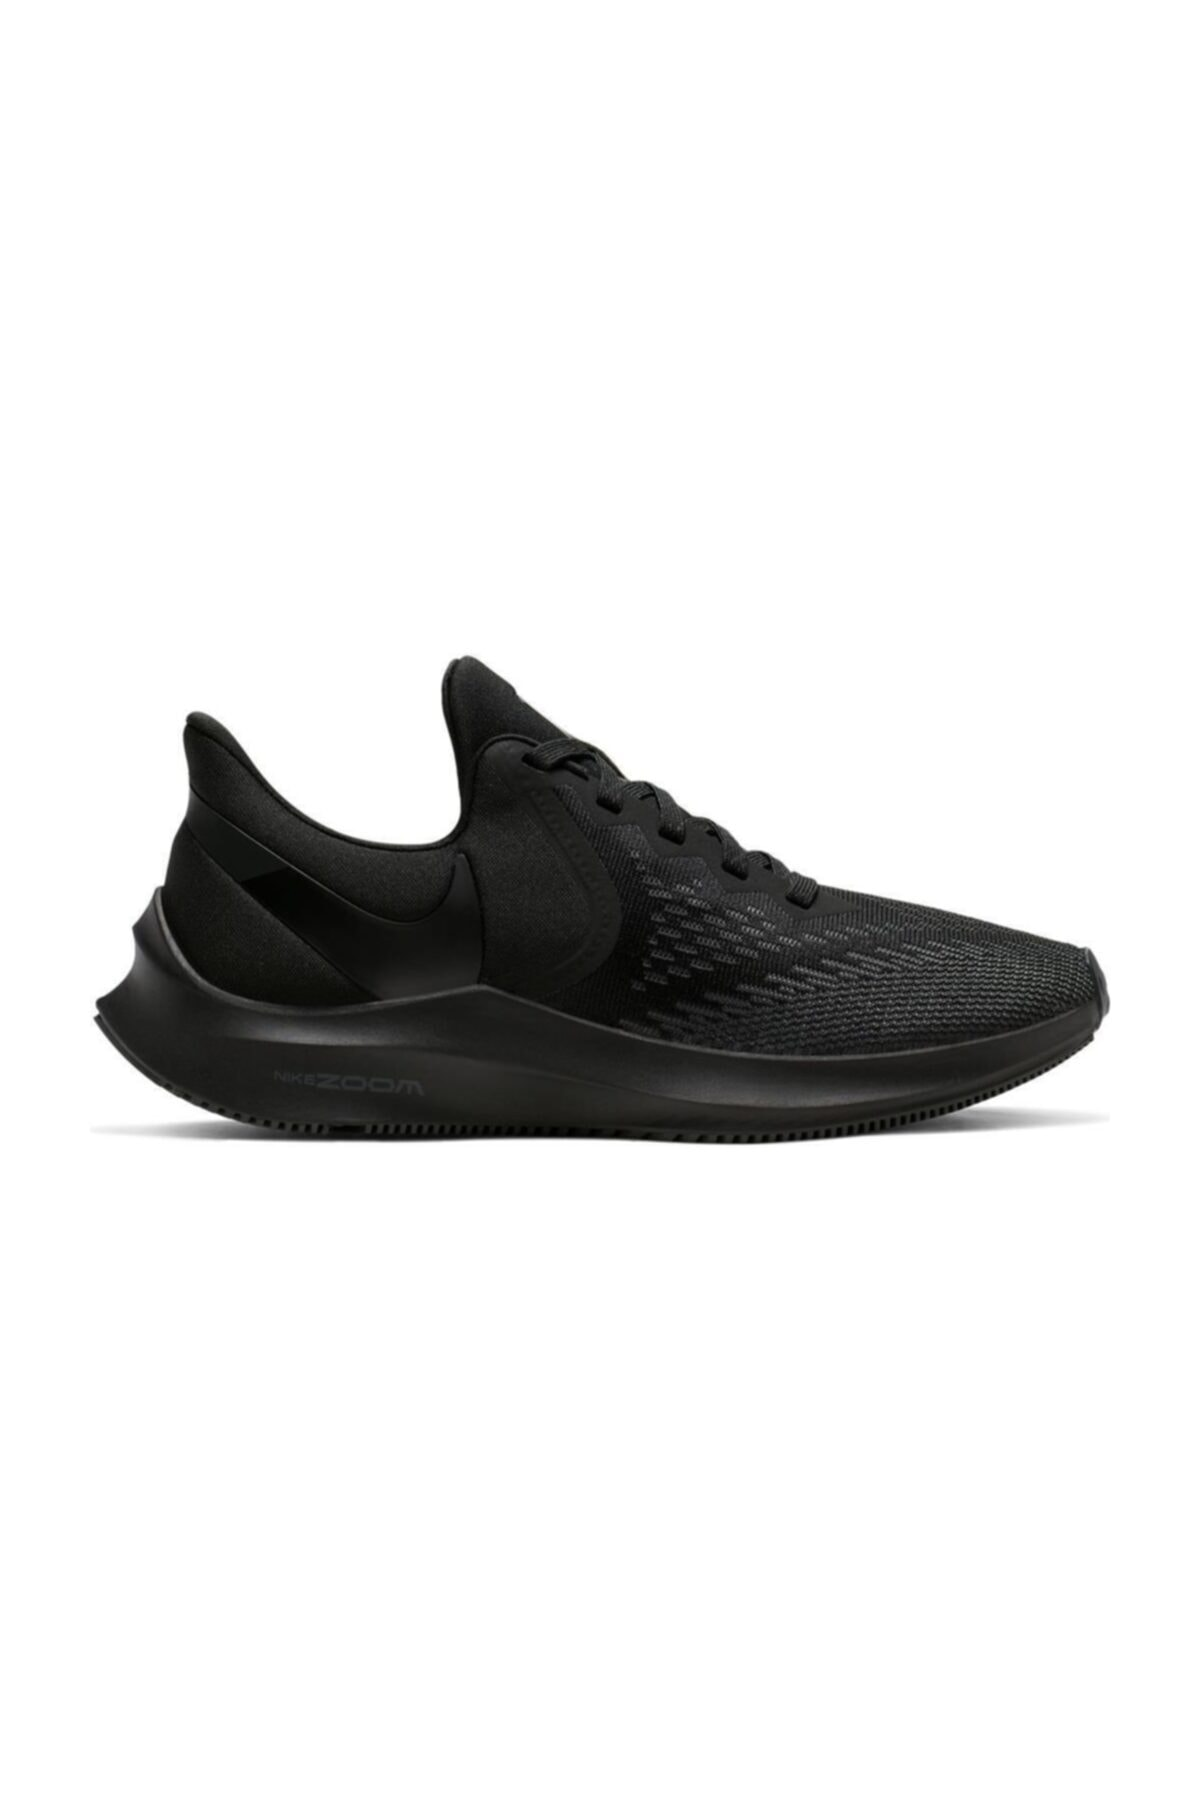 Nike Zoom Wınflo 6 Aq8228-004 Kadın Spor Ayakkabı Siyah-38 1